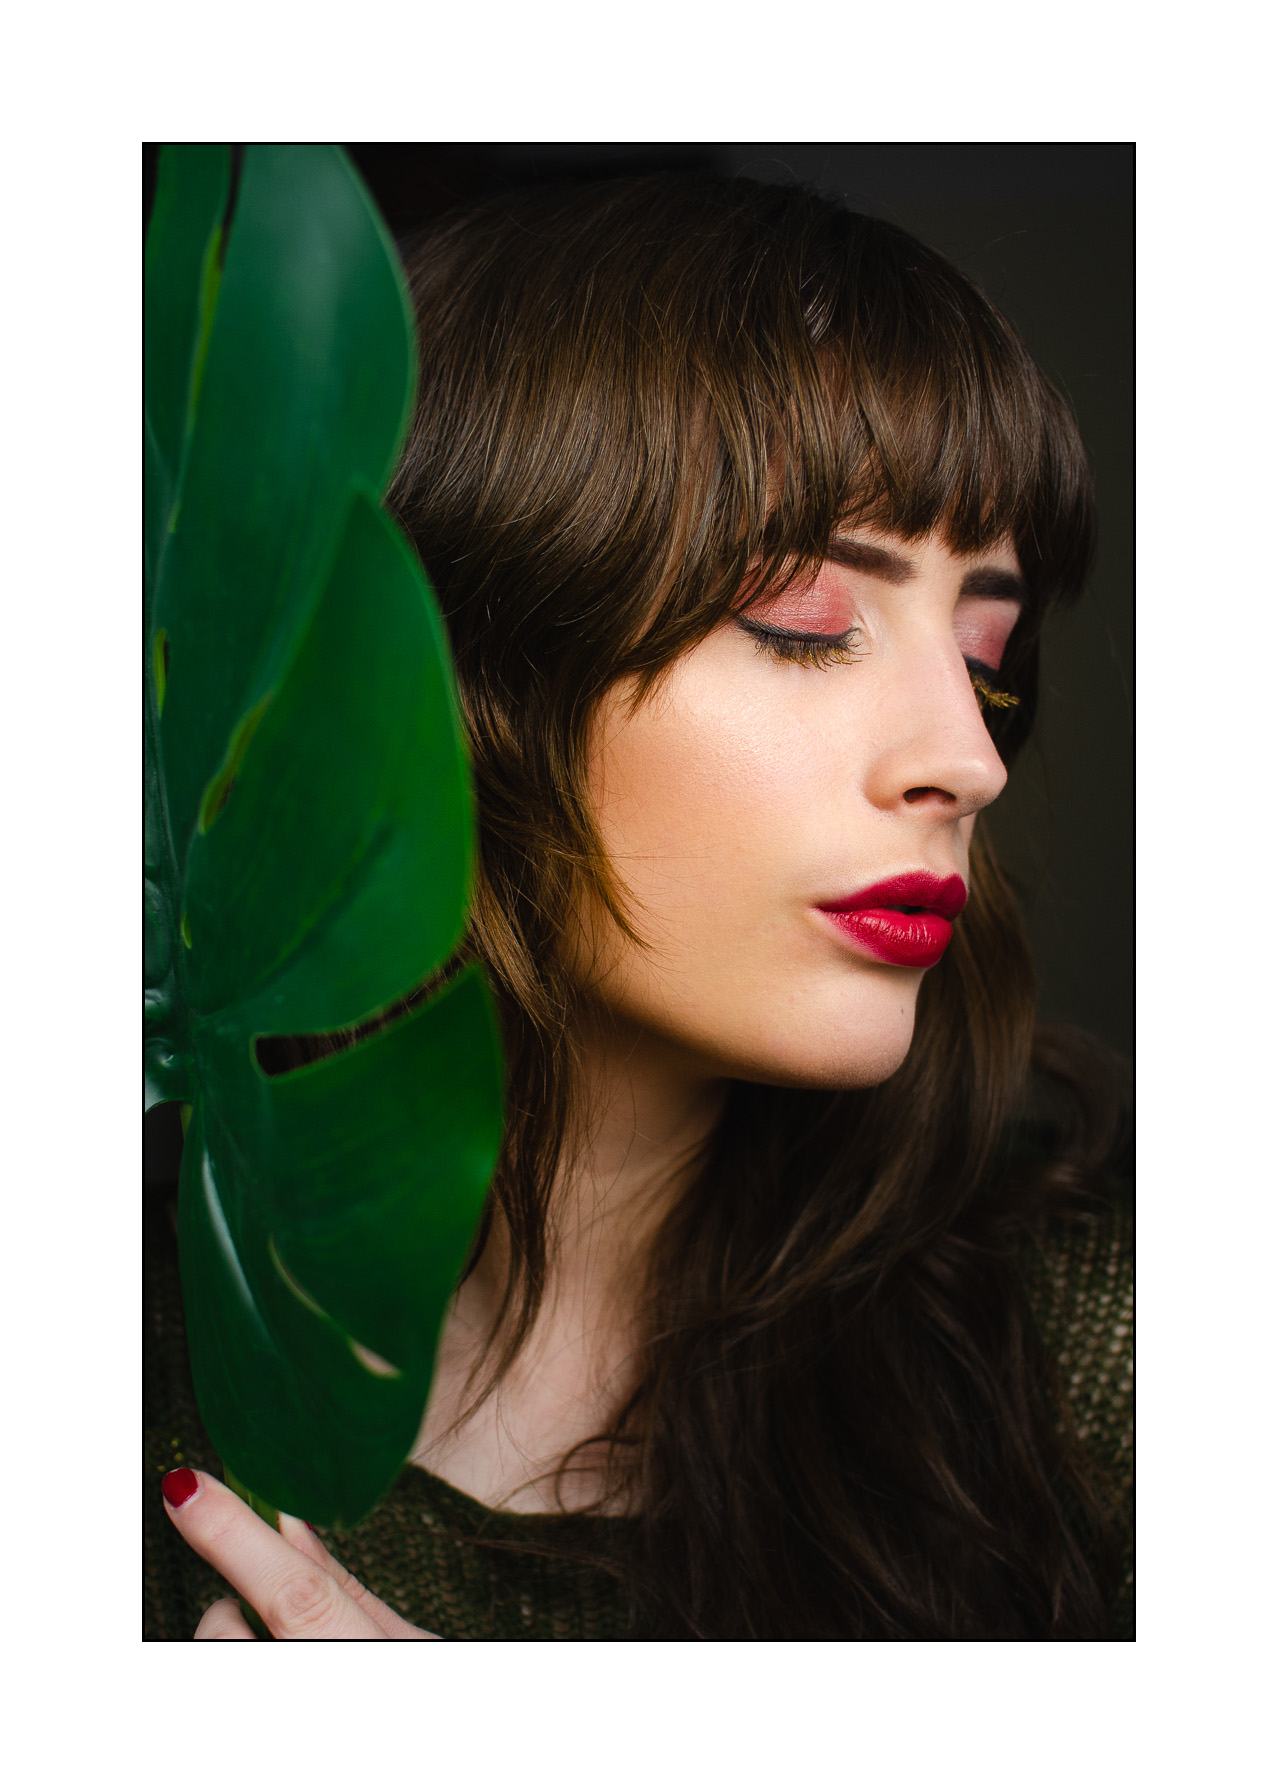 Mascara Topcoat in Gold-Lancôme und Proenza Schouler-Abend Make-Up mit Lancôme-Beautyblog-OPI Winter Kollektion Nussknacker-andysparkles